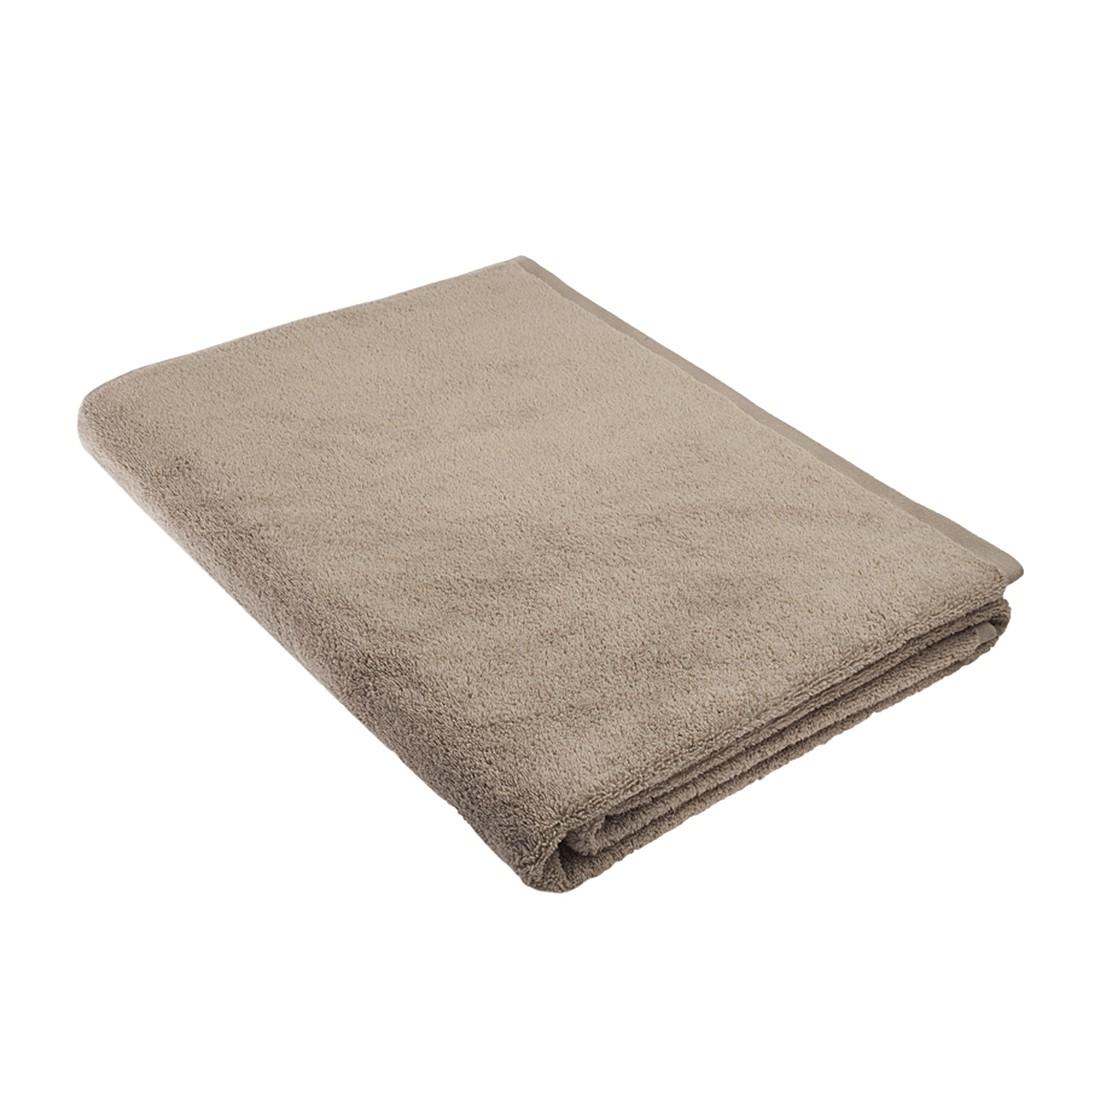 Home 24 - Serviette de sauna pure - 100 % coton - beige, stilana